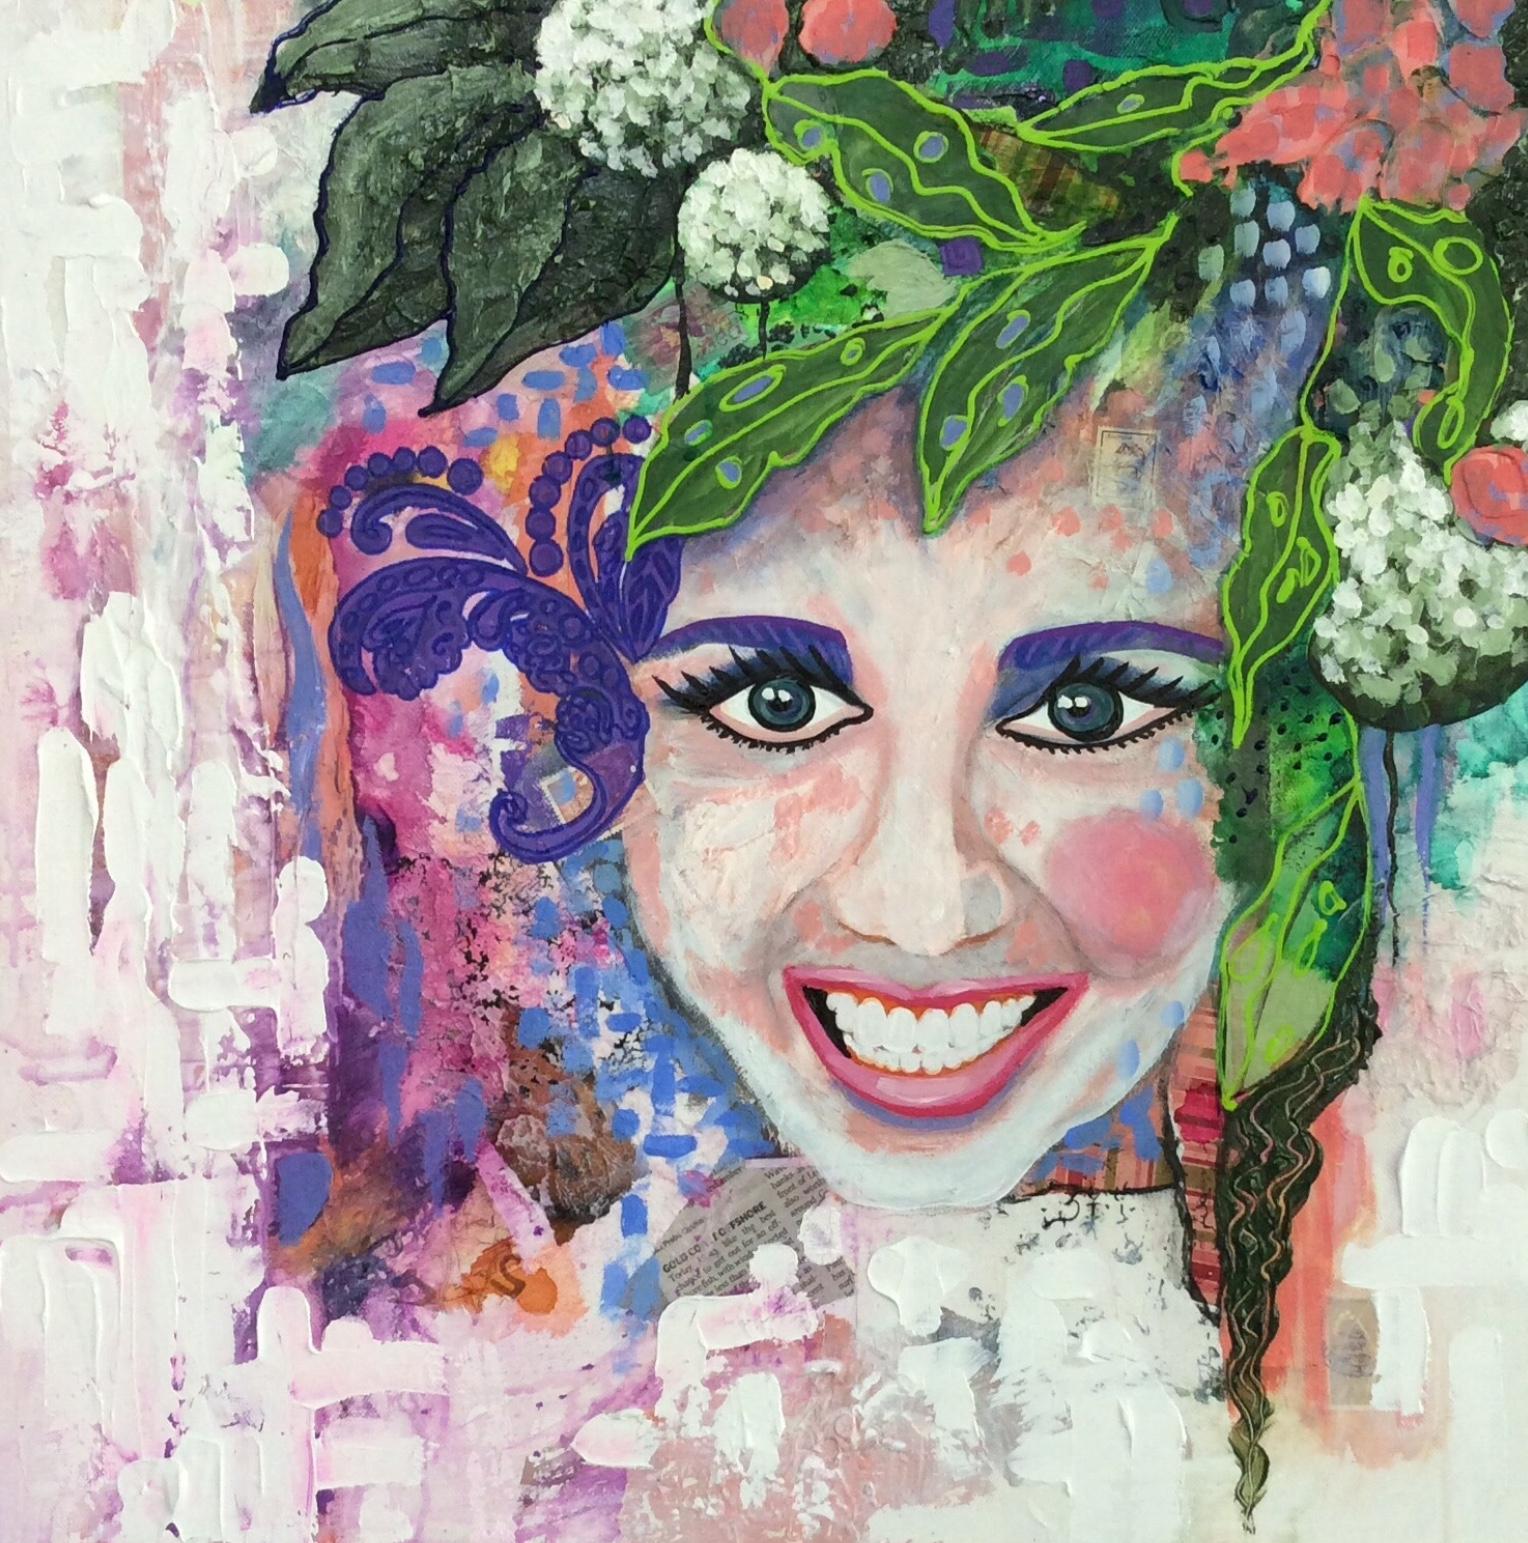 Didi- A Self Portrait